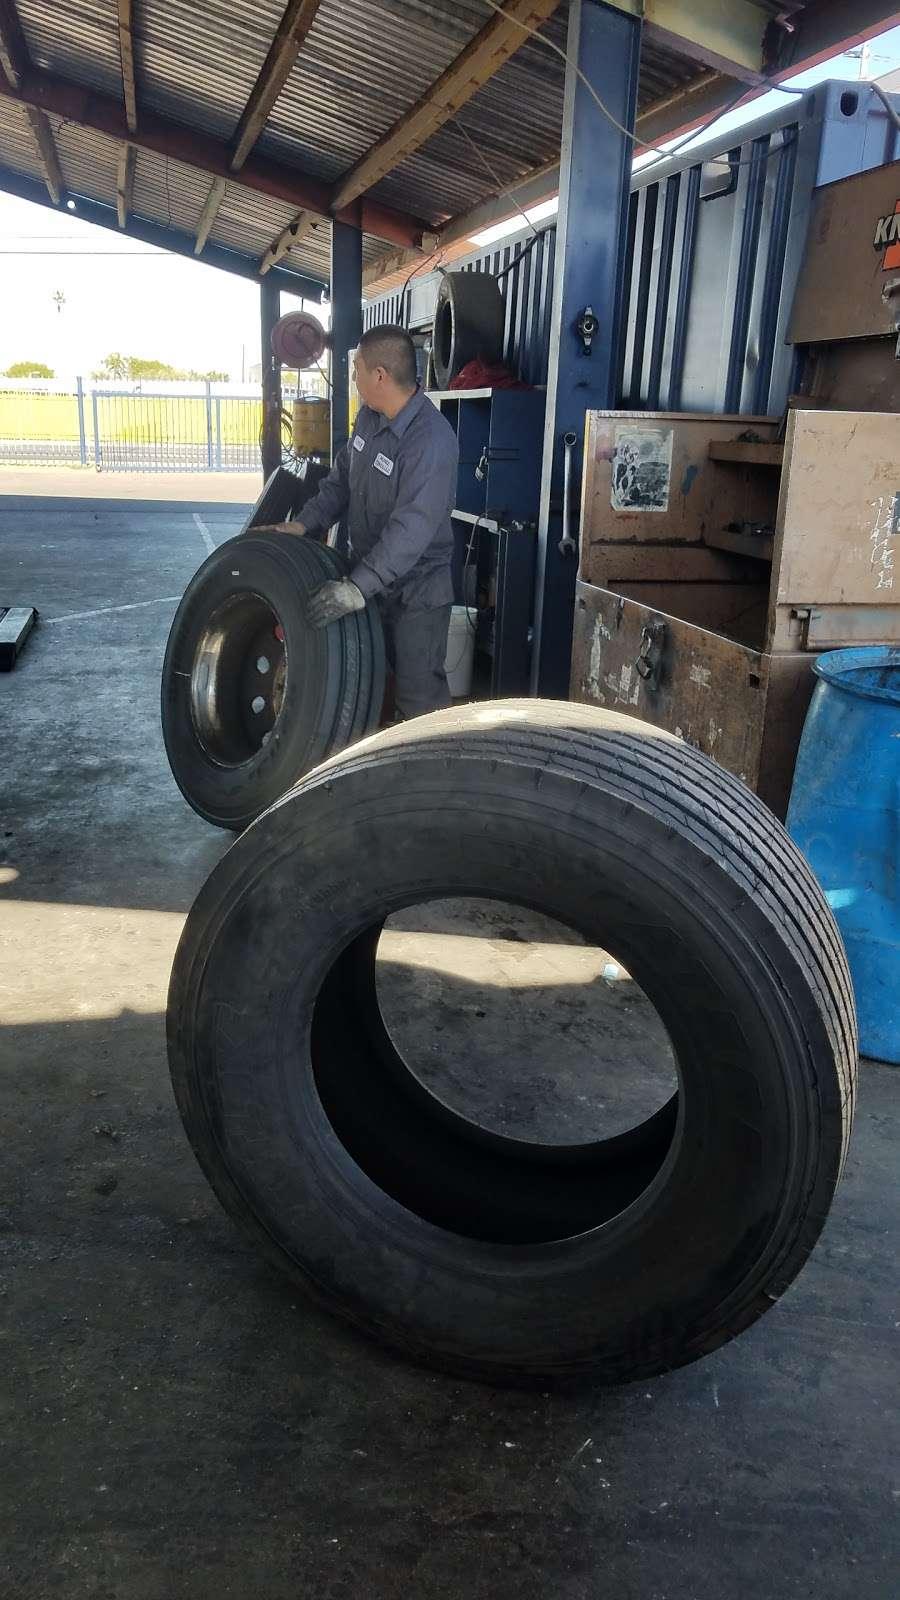 Nunez Tire - car repair    Photo 3 of 7   Address: 3101 W Buckeye Rd, Phoenix, AZ 85009, USA   Phone: (602) 455-8709